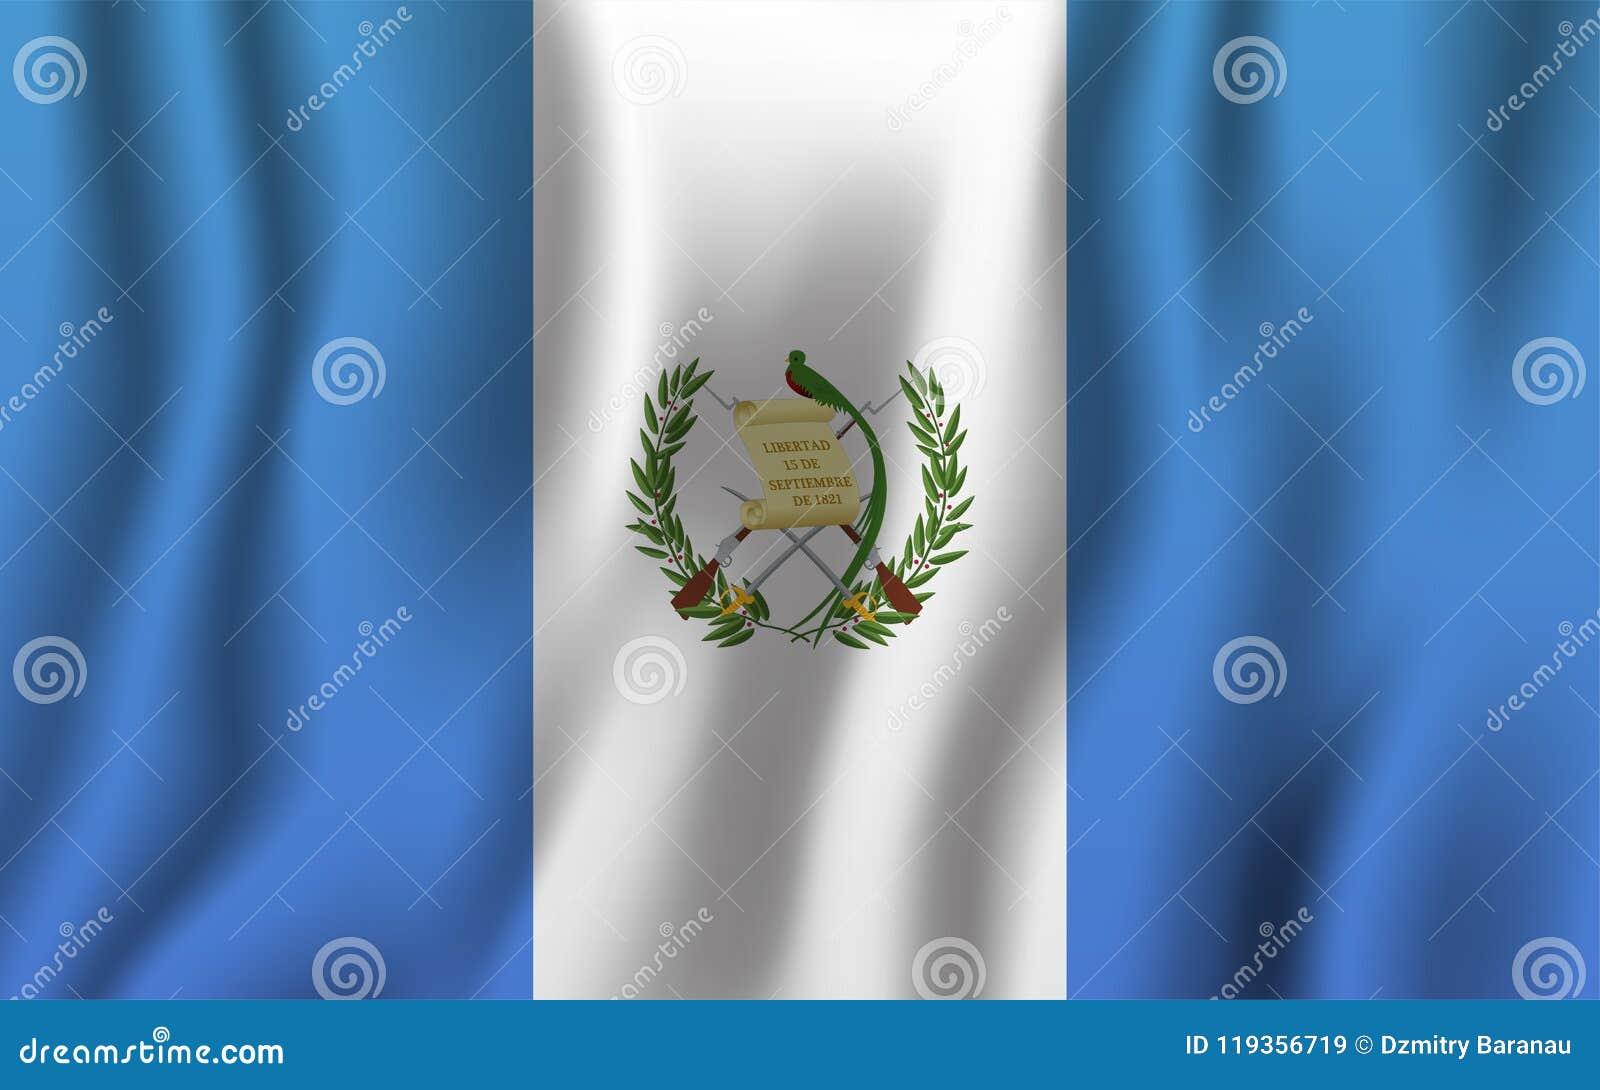 Guatemala Realistic Waving Flag Vector Illustration National Co